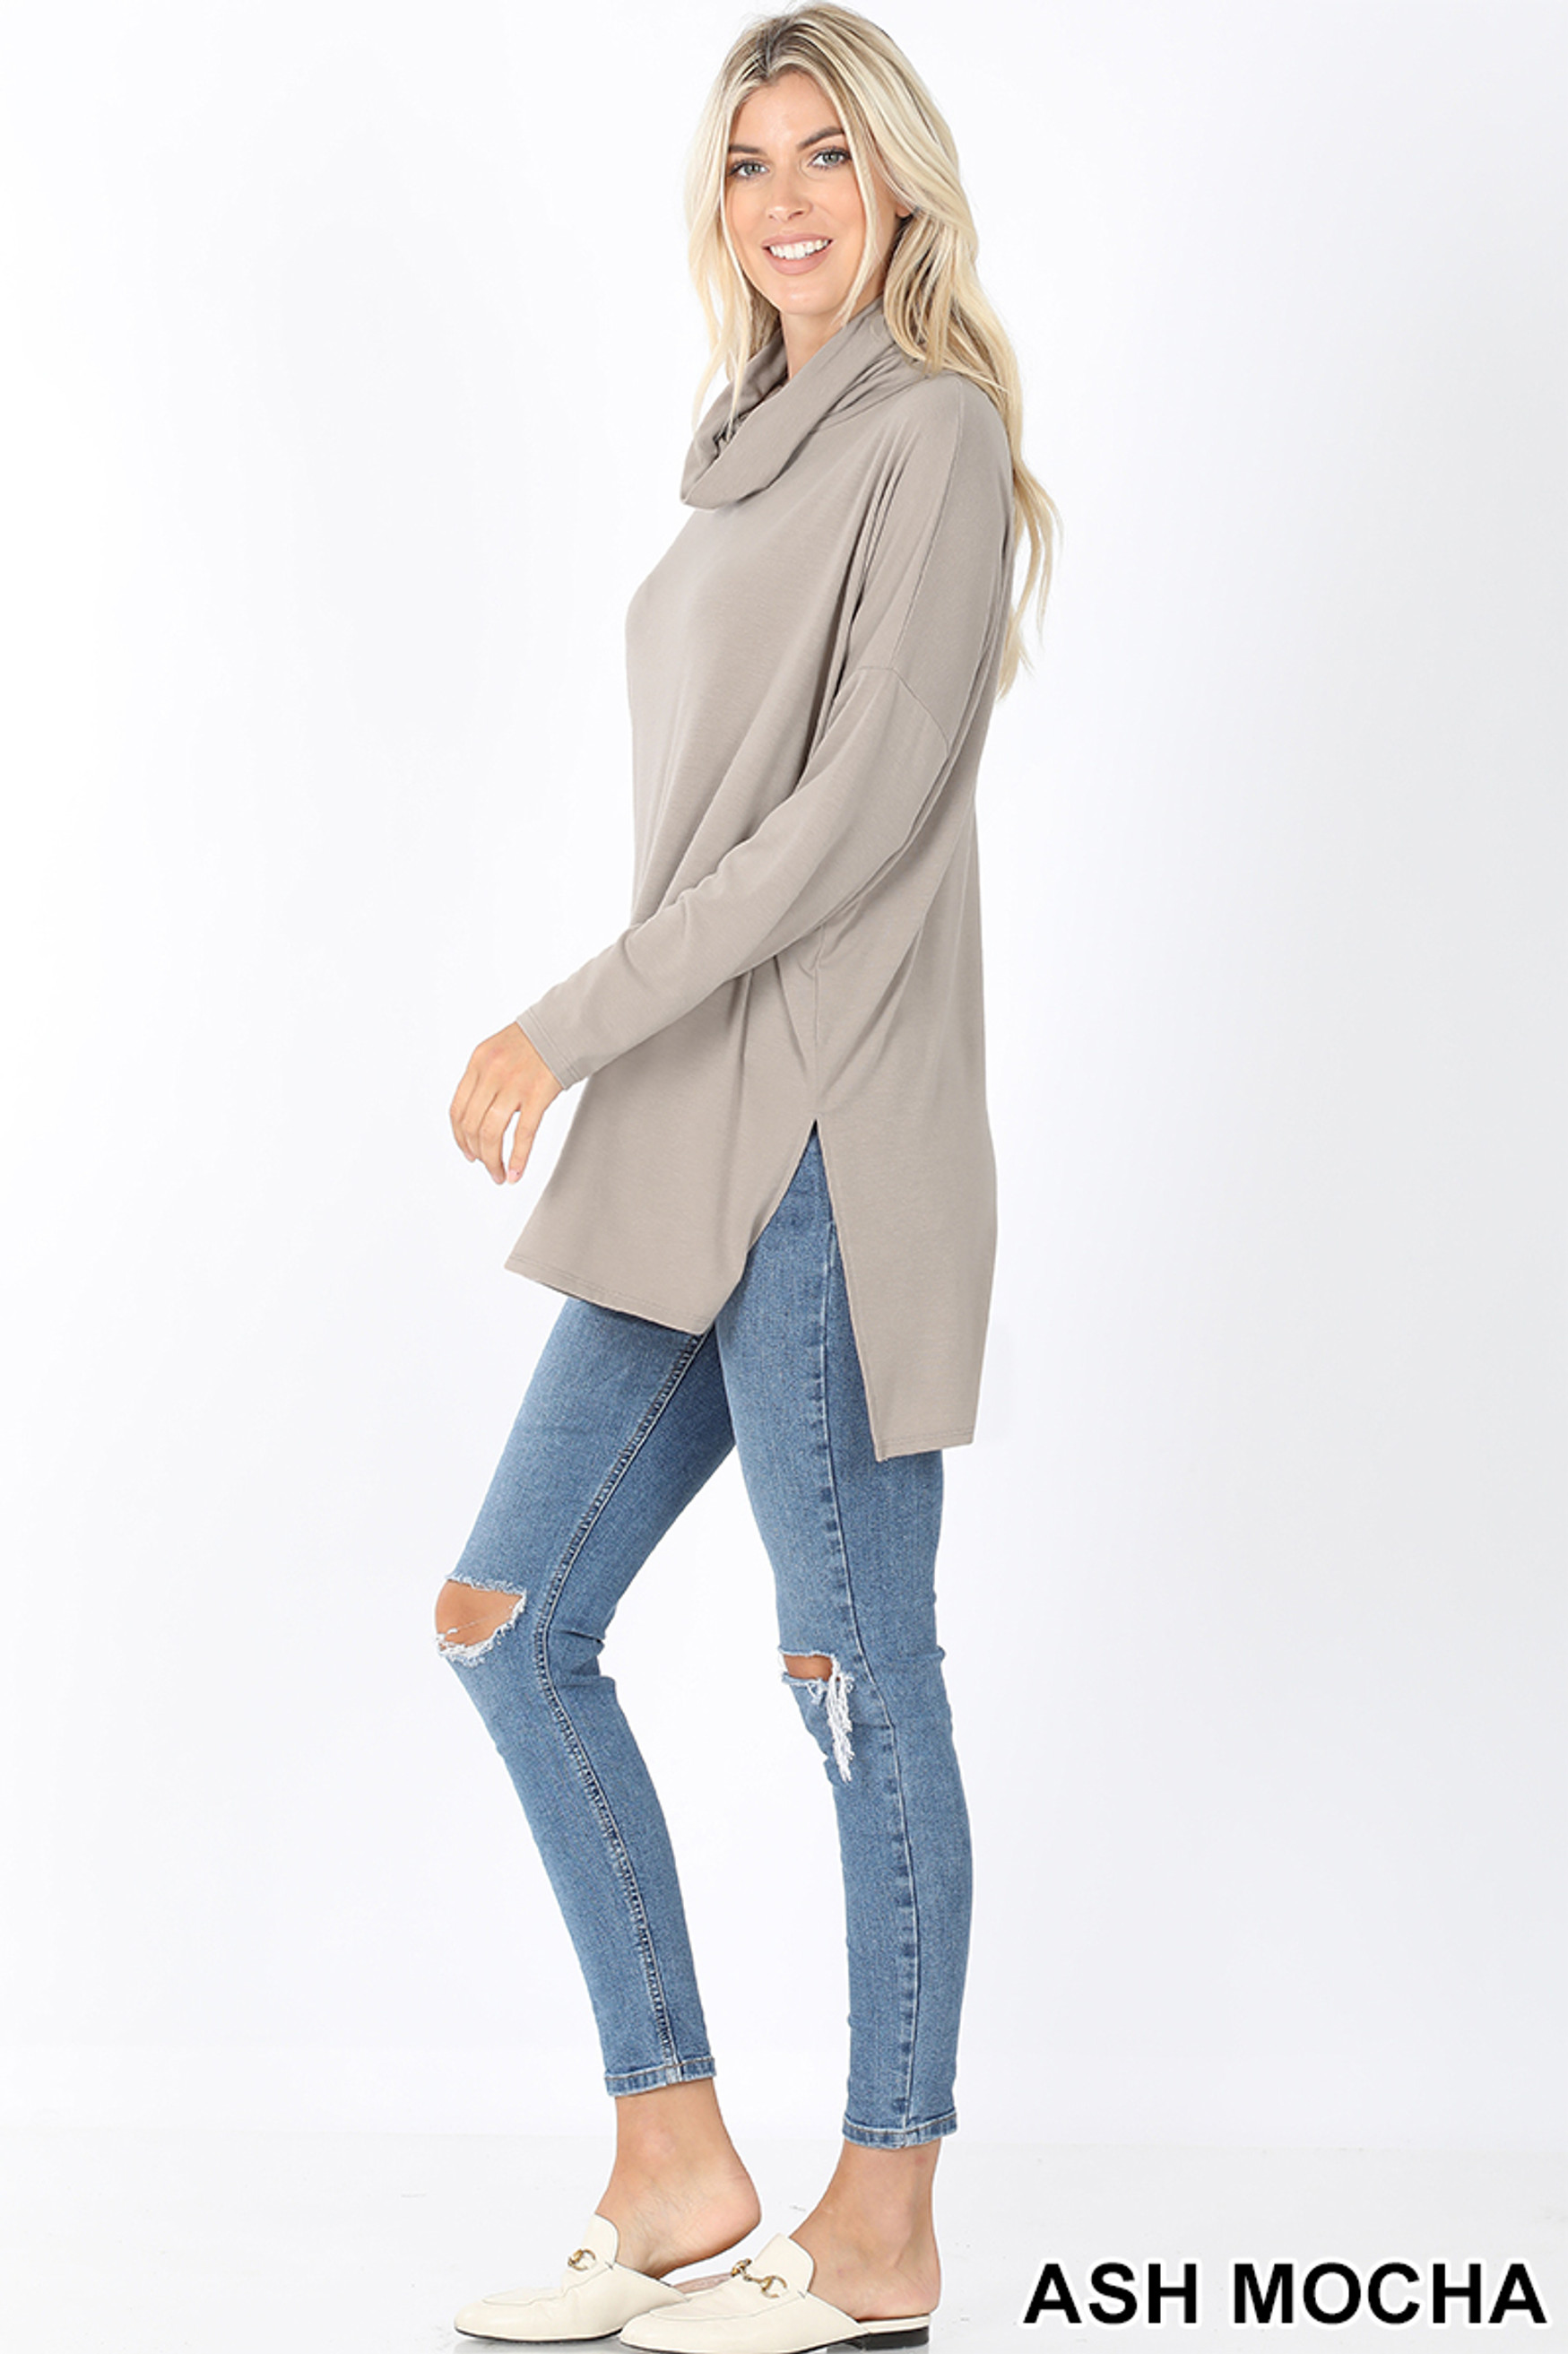 Full body left side image of Ash Mocha Cowl Neck Hi-Low Long Sleeve Plus Size Top